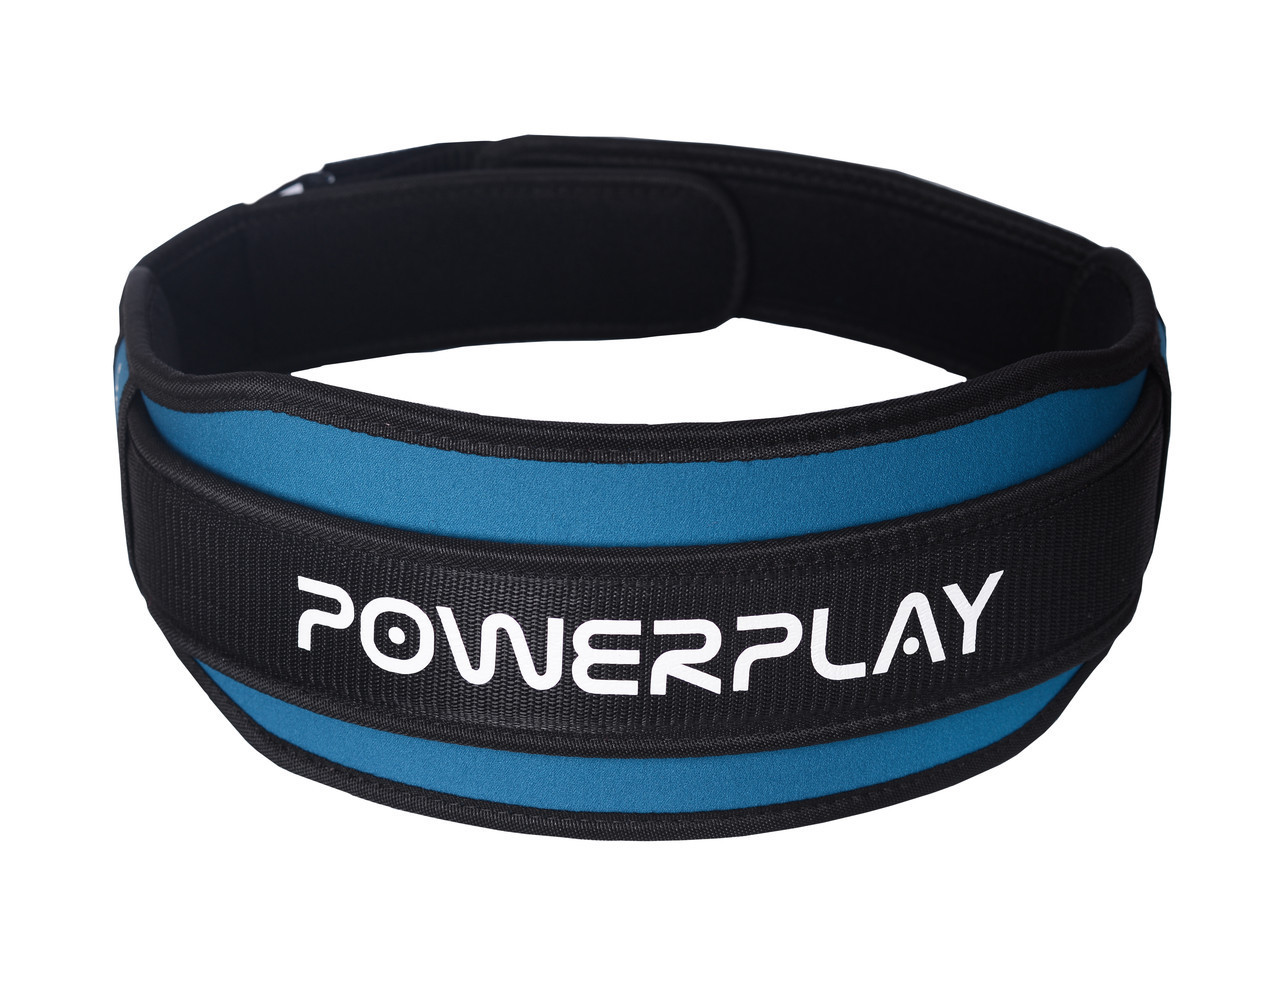 Пояс для важкої атлетики PowerPlay 5545 Синьо-Чорний (Неопрен) M